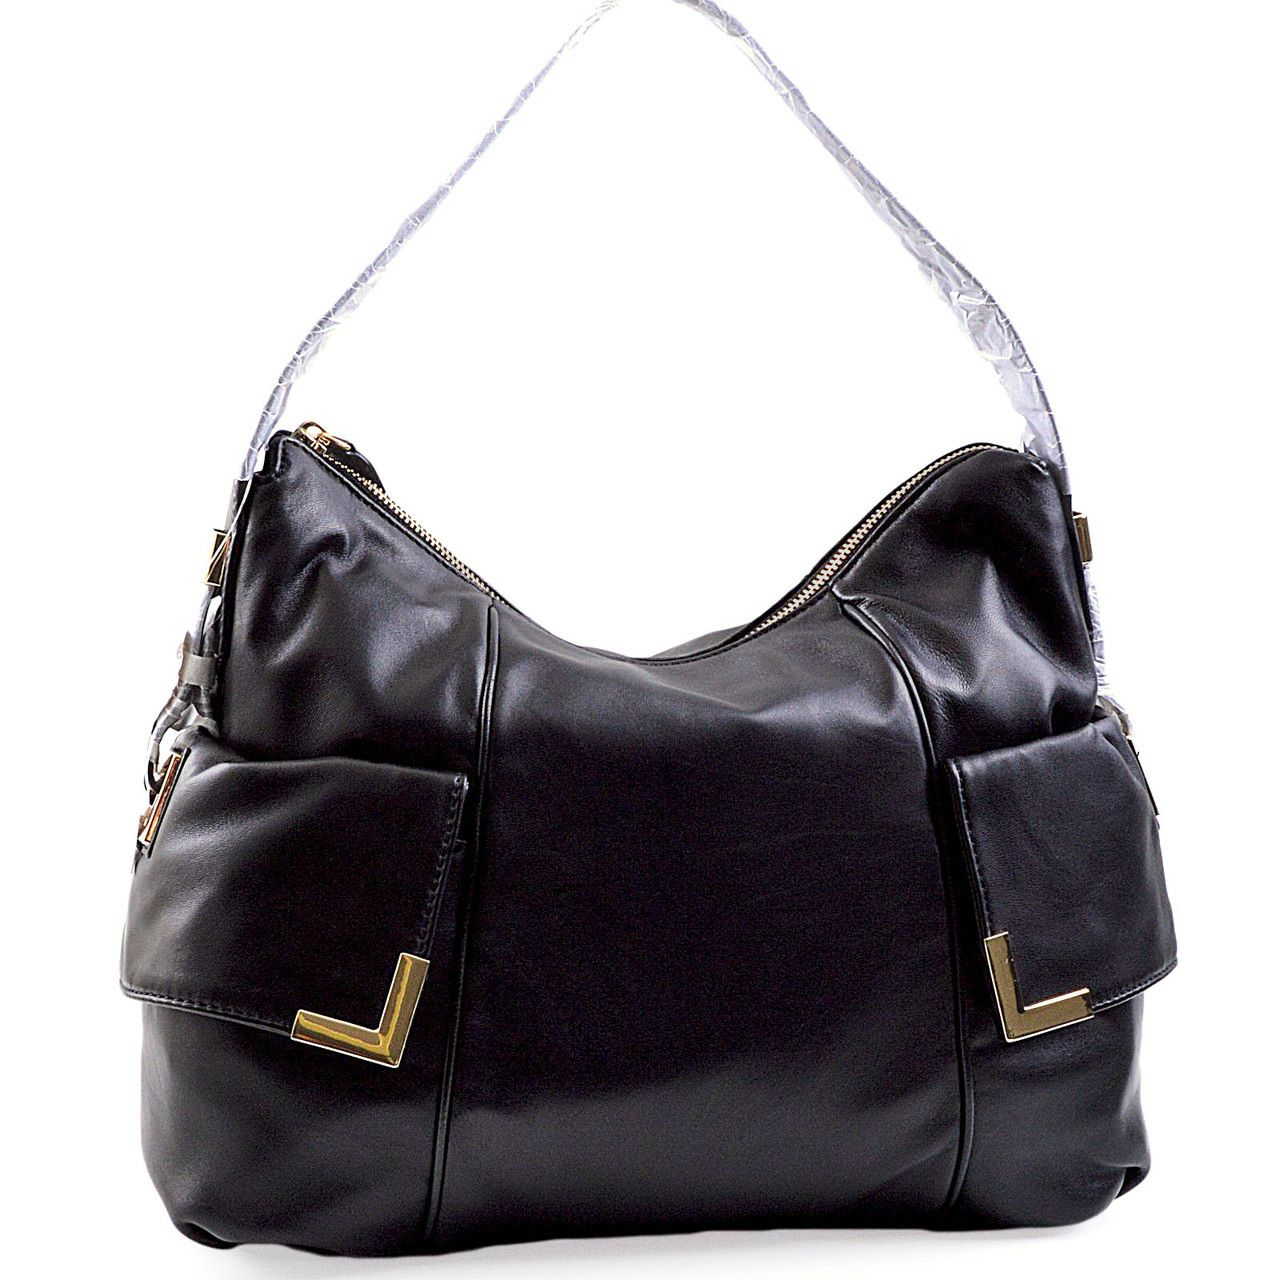 3202b02b6d Michael Kors Beverly Large Top Zip Shoulder Bag